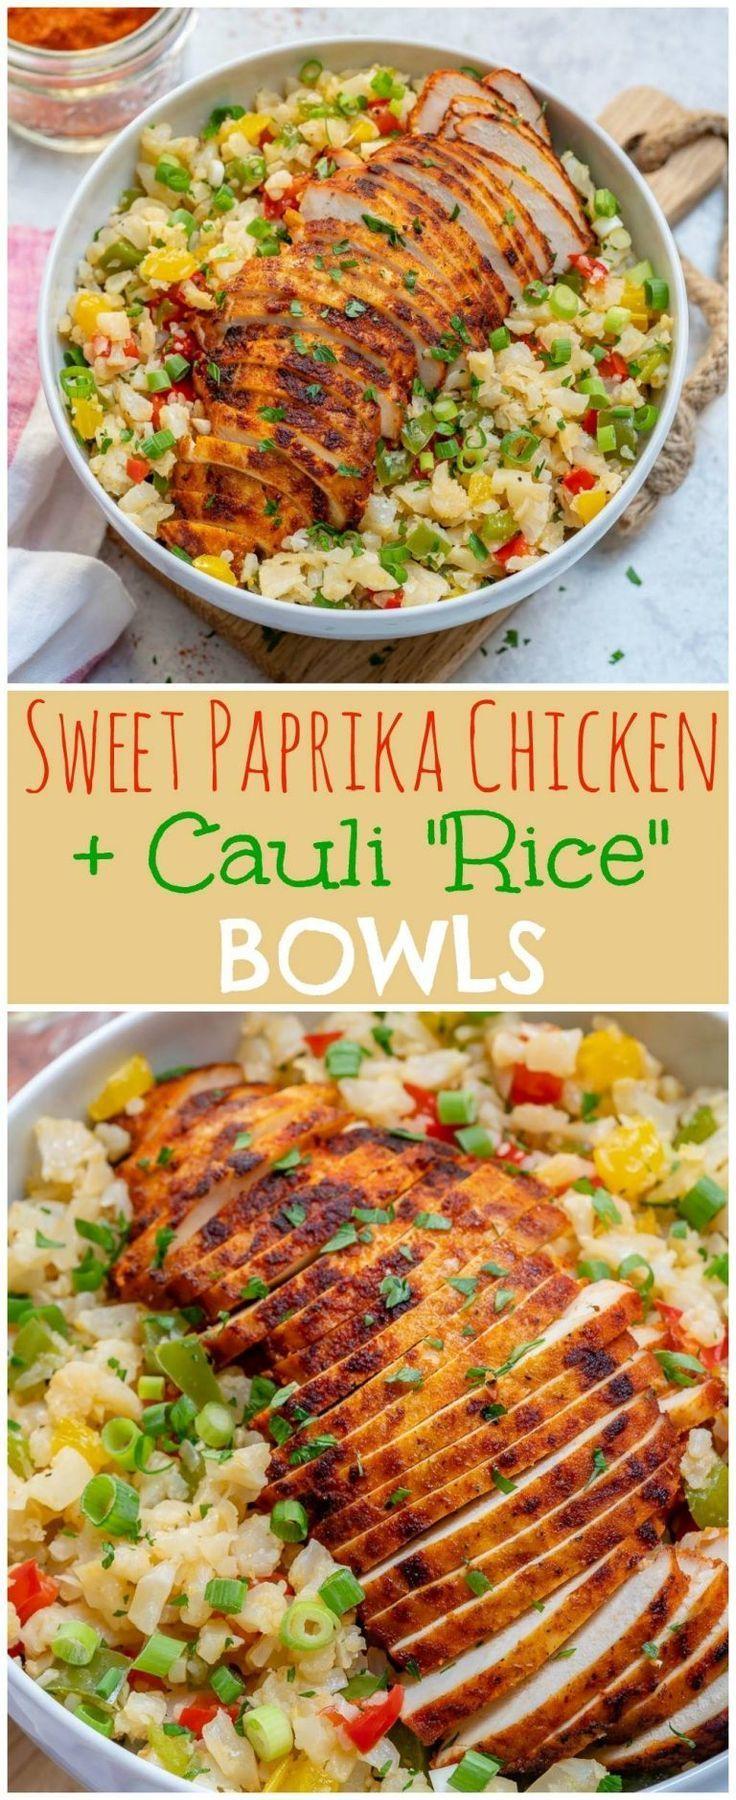 "Sweet Paprika Chicken + Cauli ""Rice"" Bowls images"